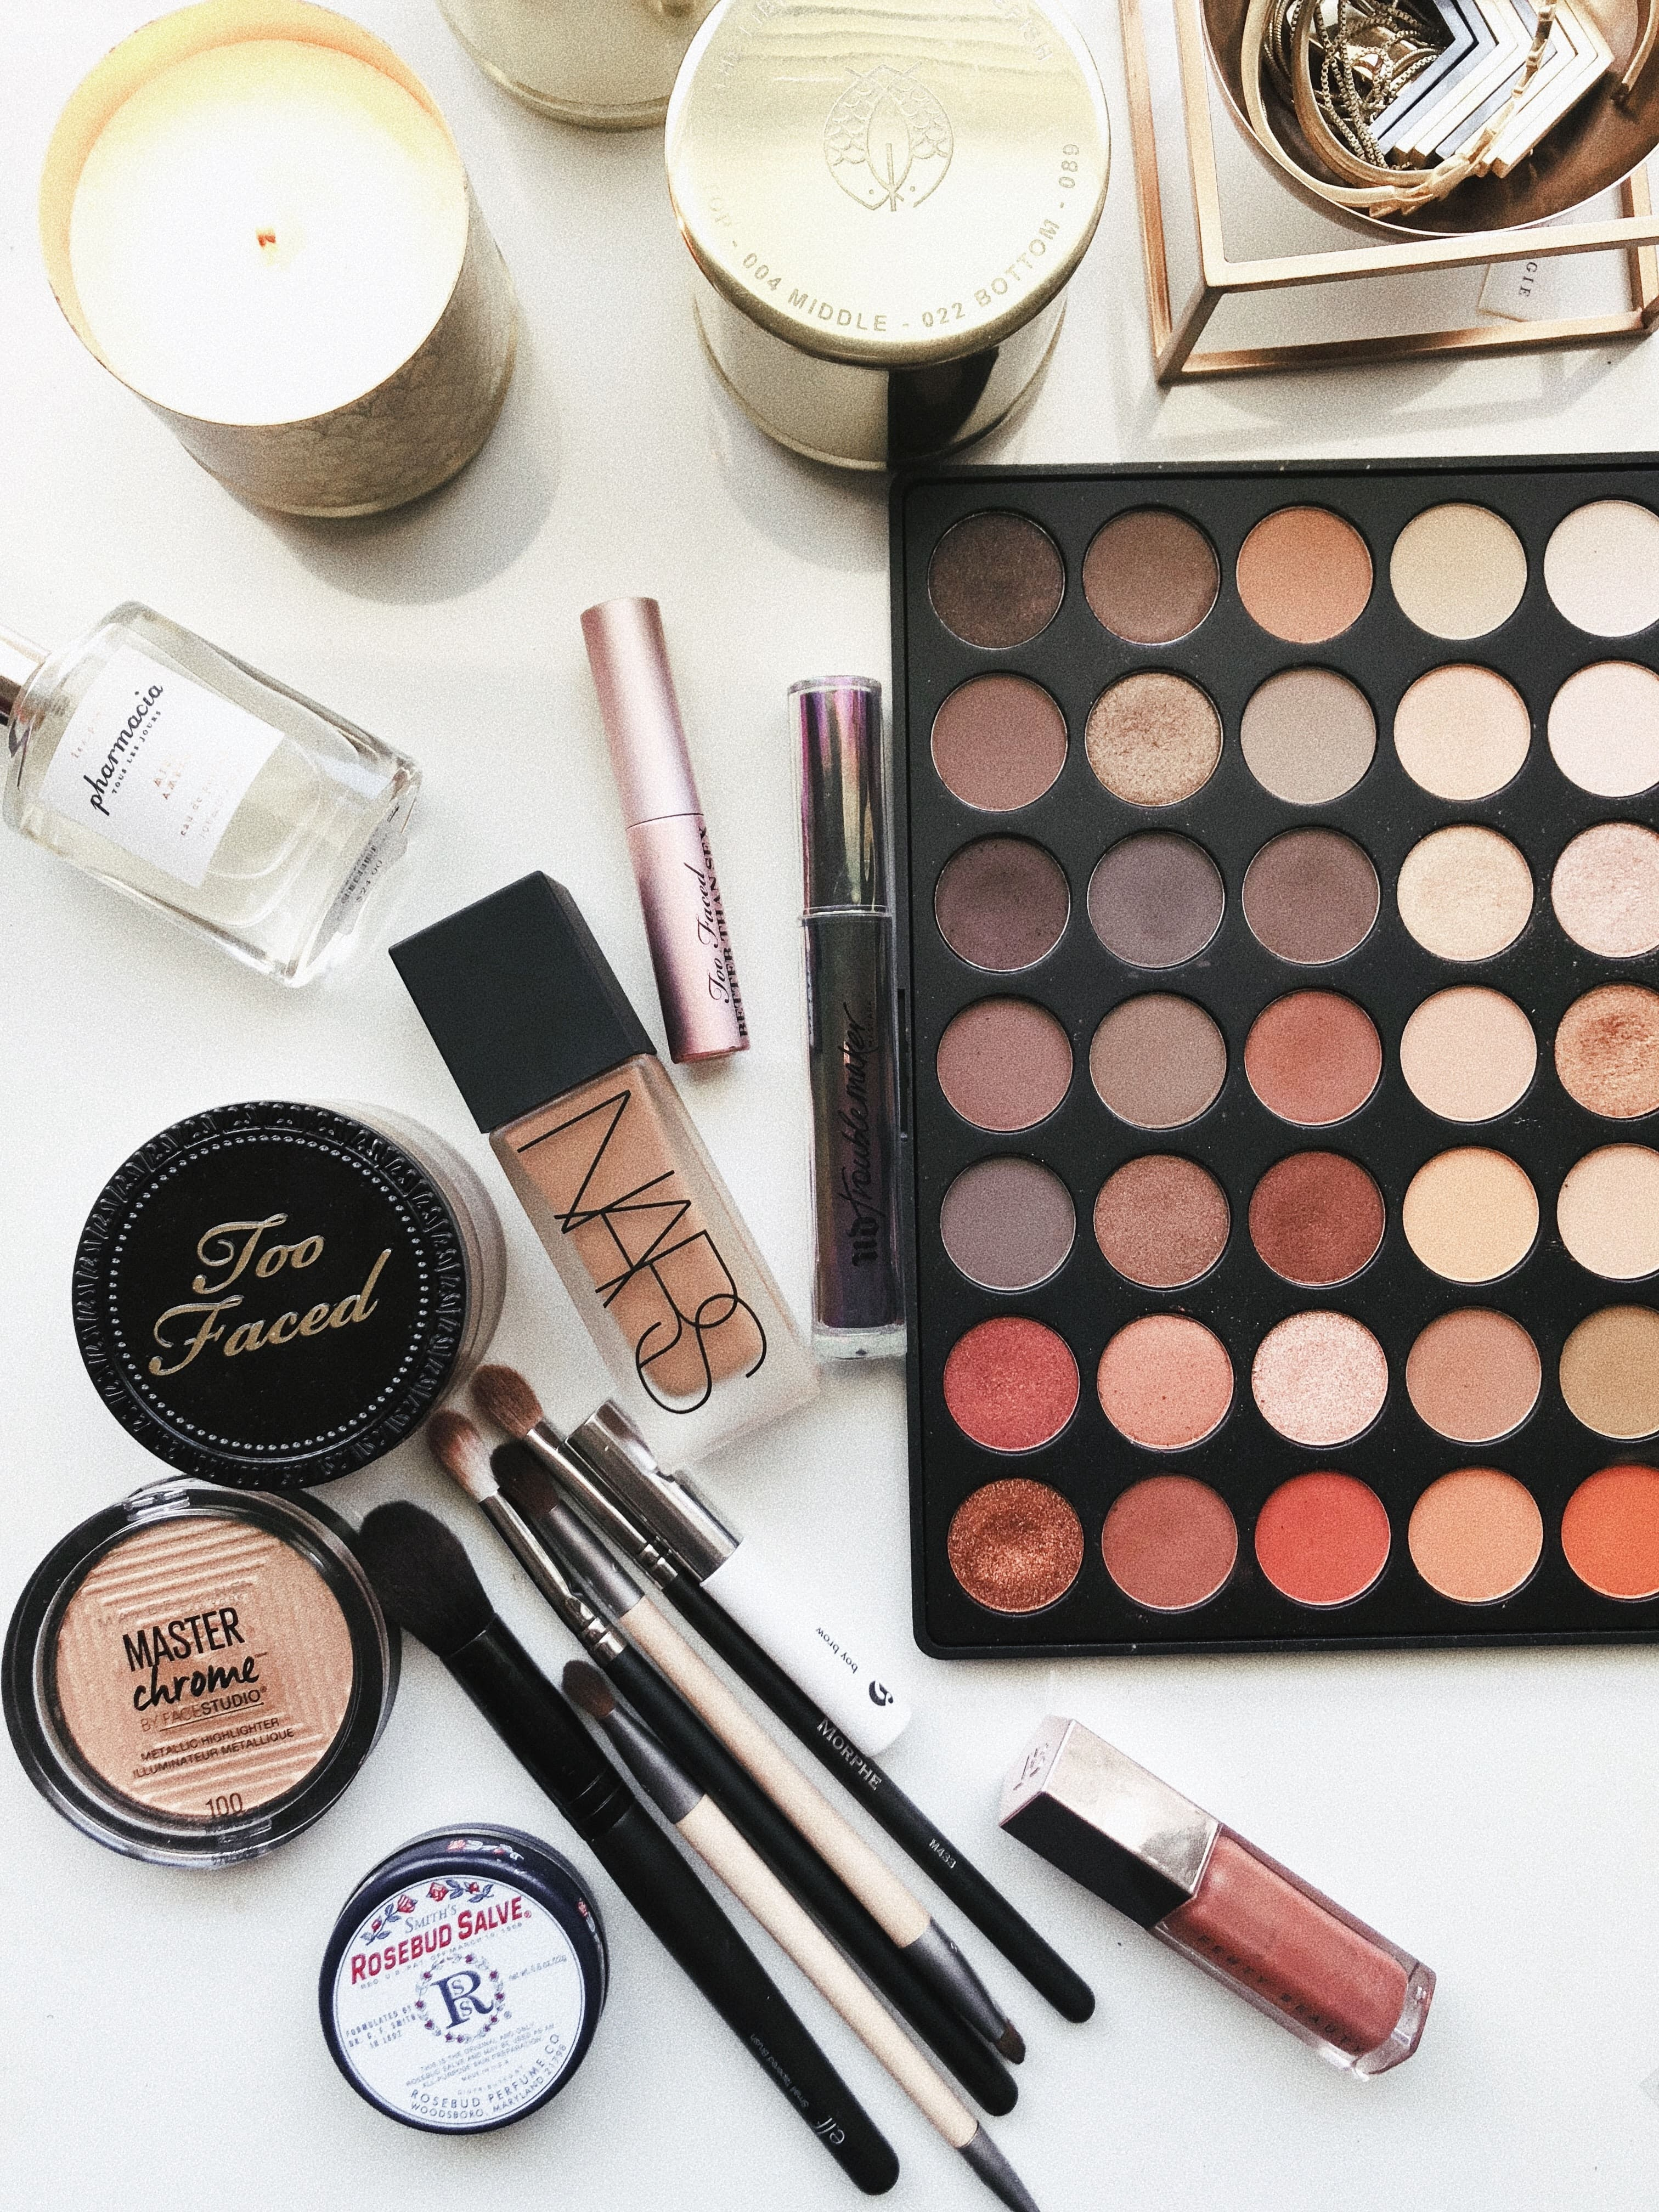 an array of makeup, foundation, lipsticks and eyeshadows.